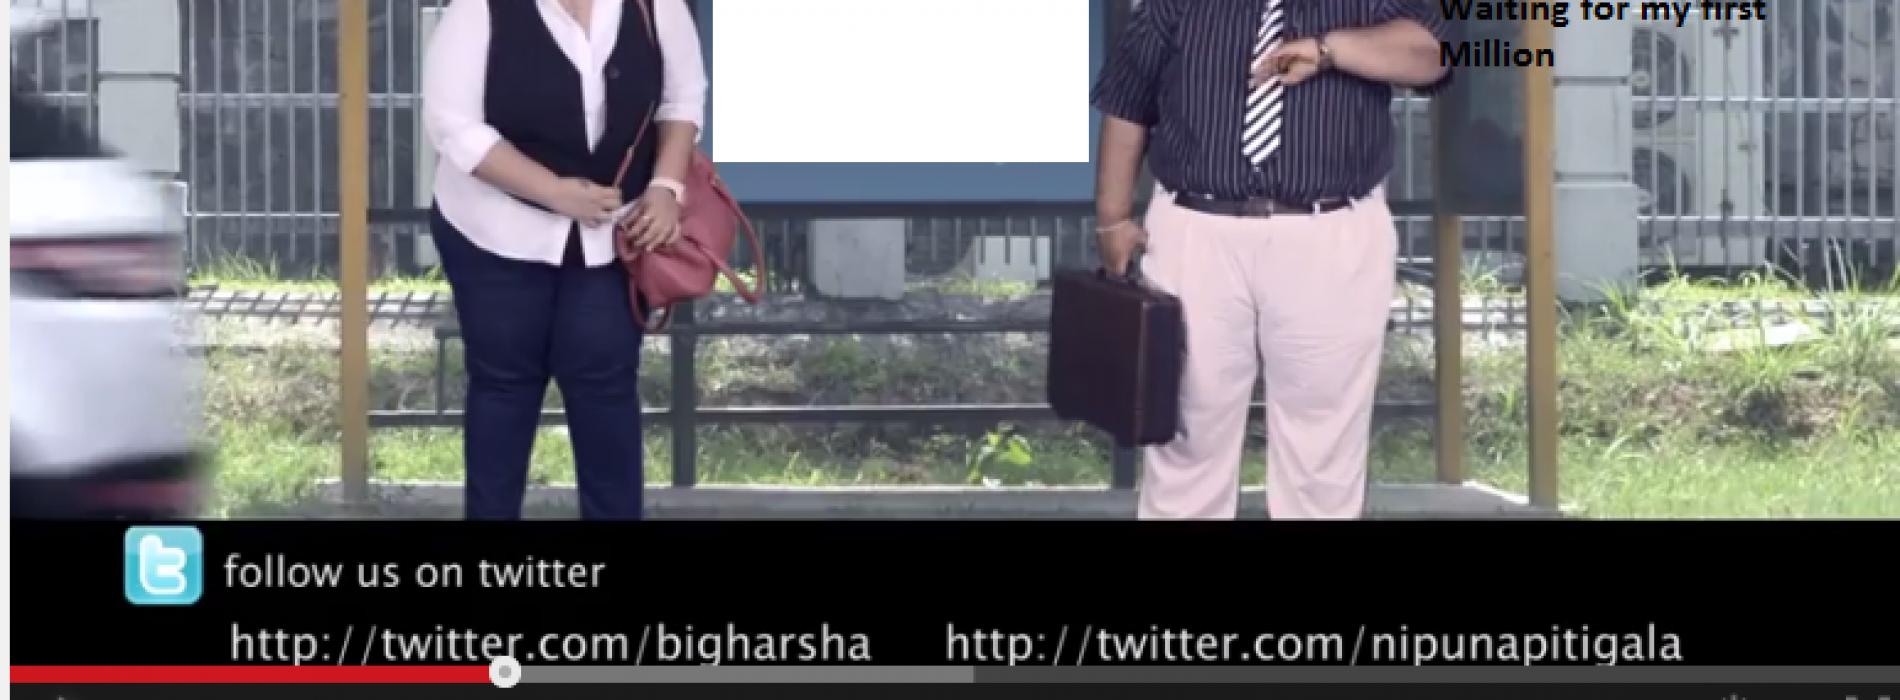 Big Harsha Makes An Impressive Record With His Latest Single